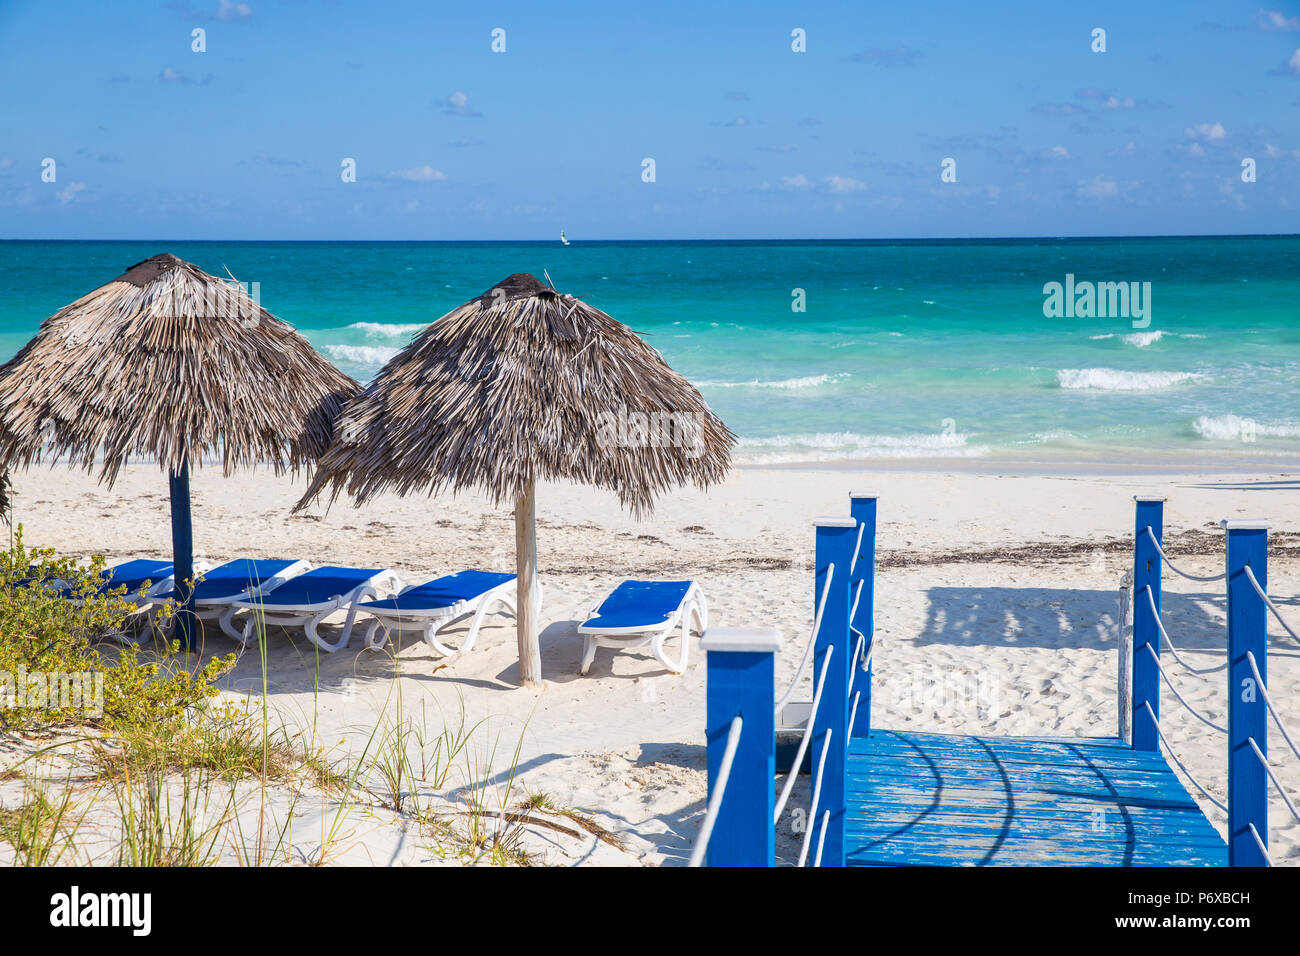 Cuba, Jardines del Rey, Cayo Guillermo, Playa Pilar Imagen De Stock